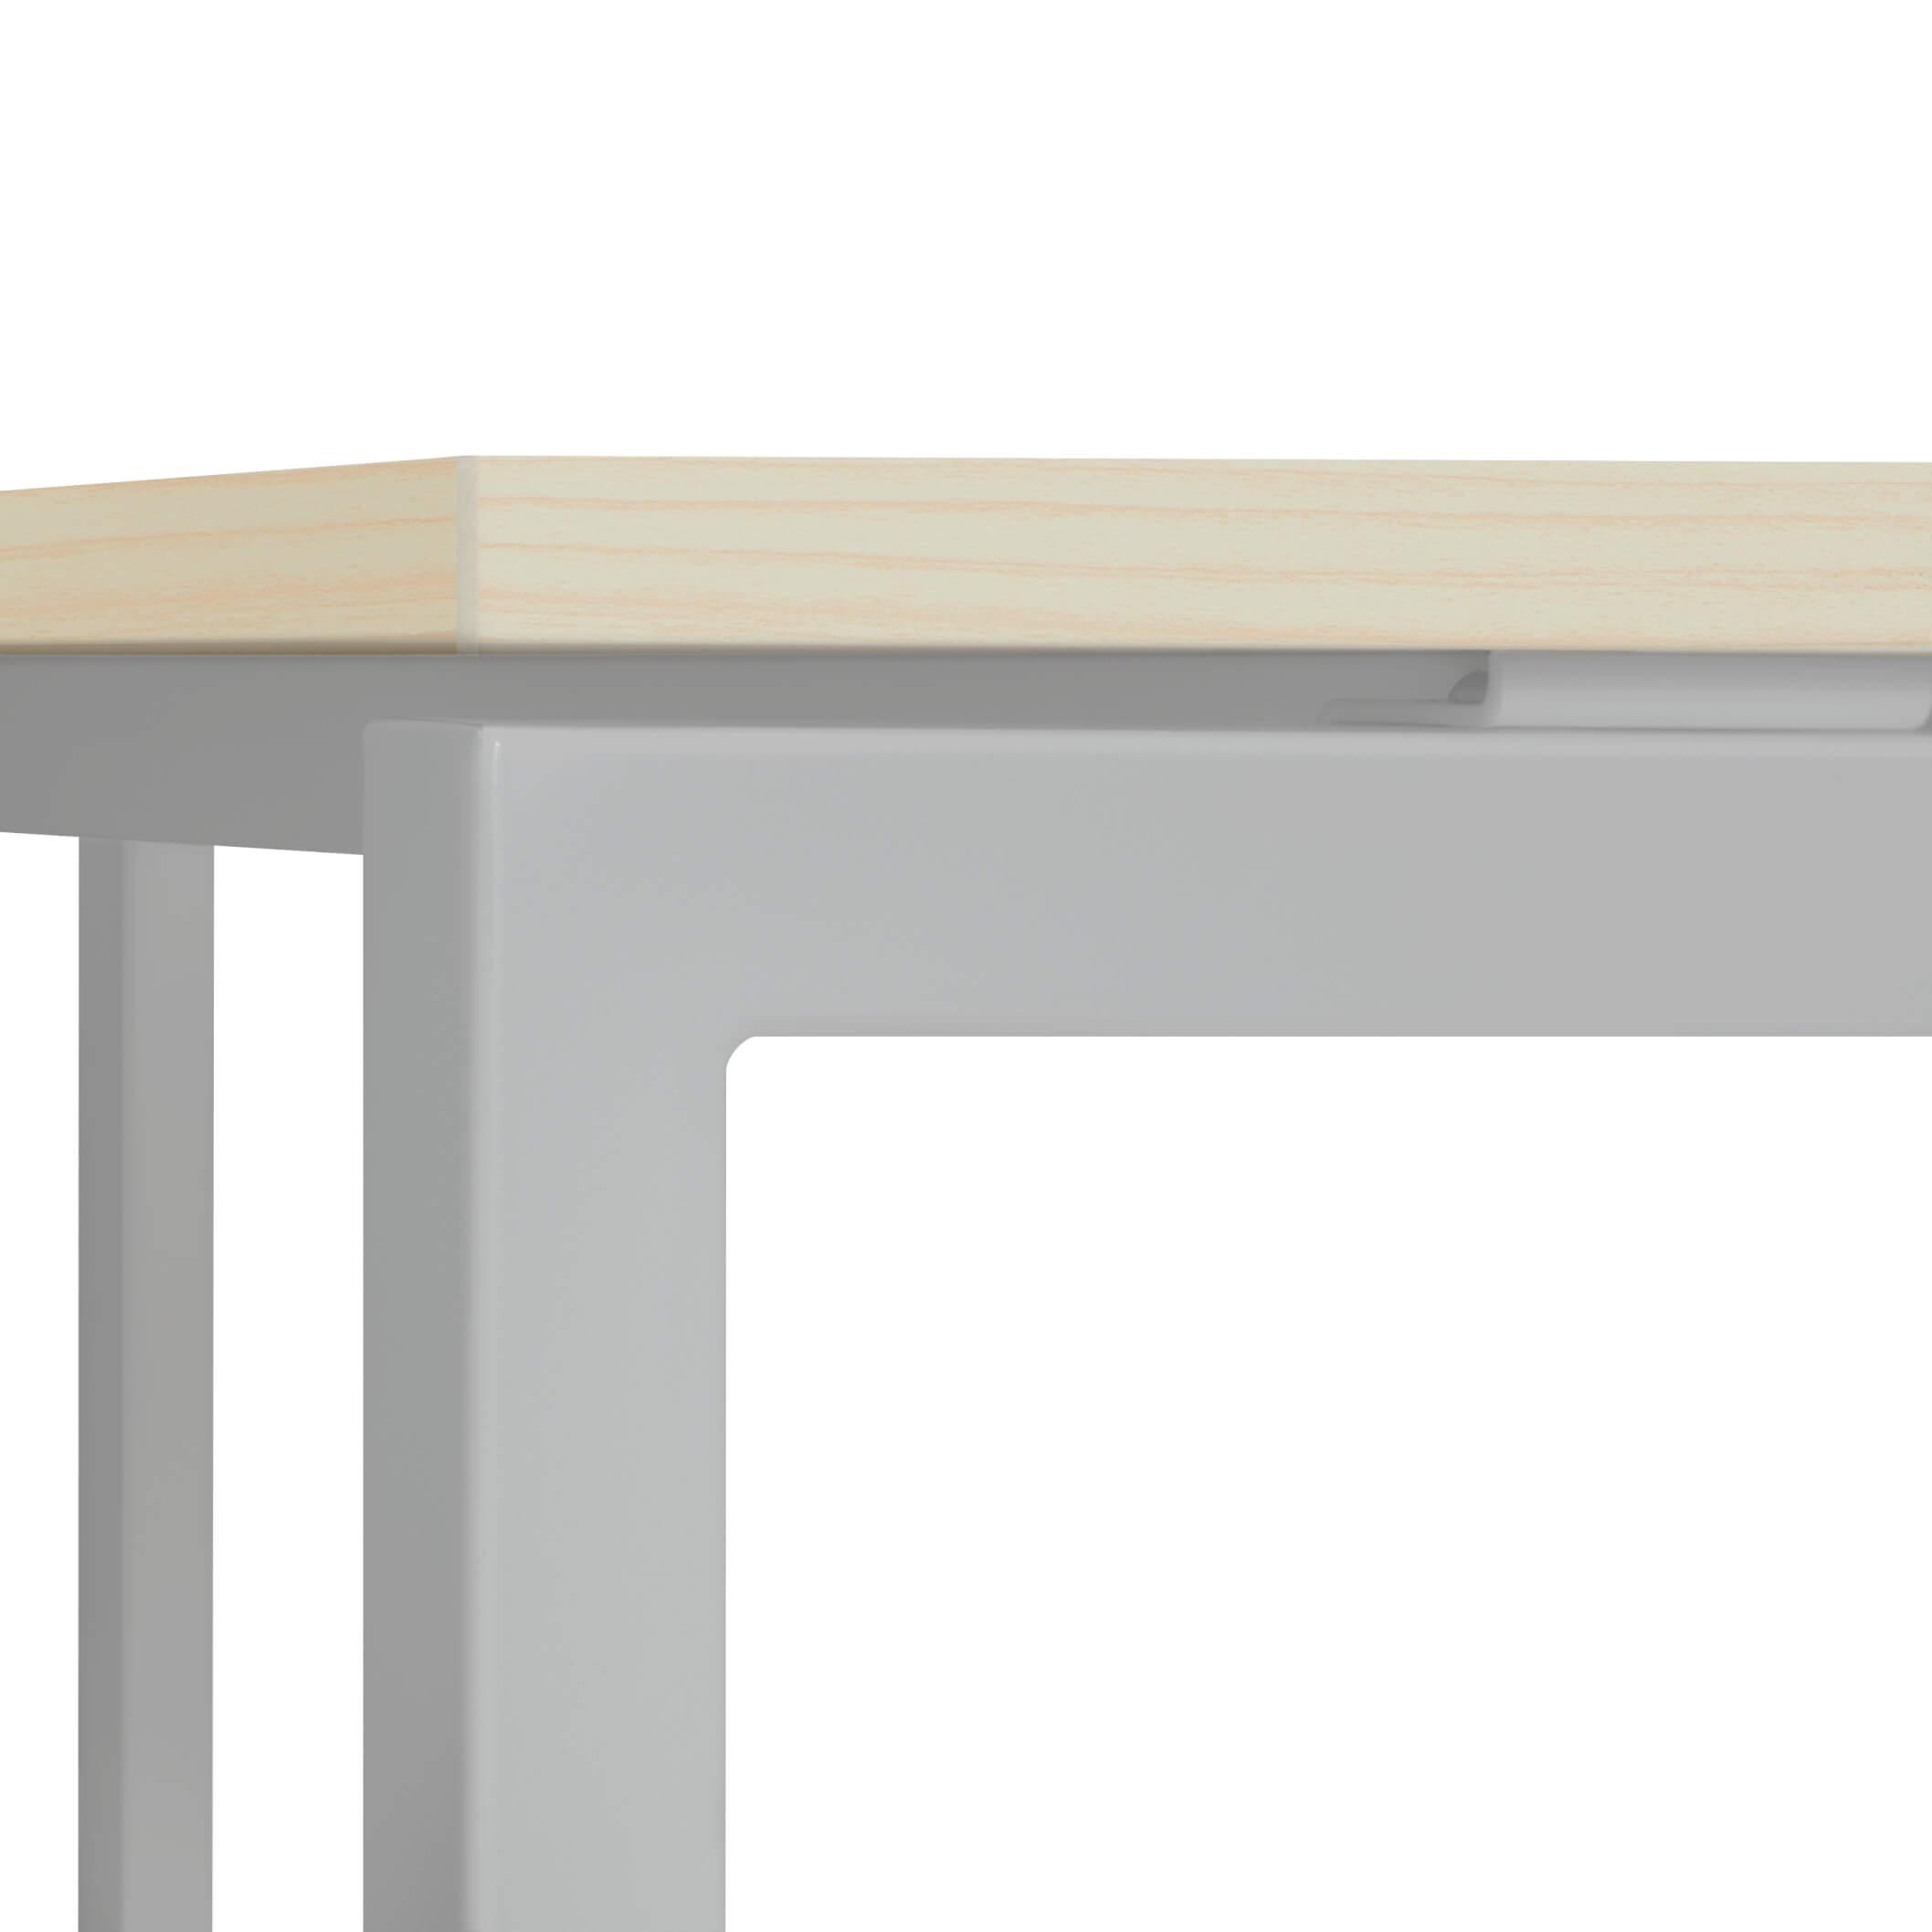 Winkelschreibtisch rechts Computertisch Eckschreibtisch 180 x 120 cm Ahorn NOVA